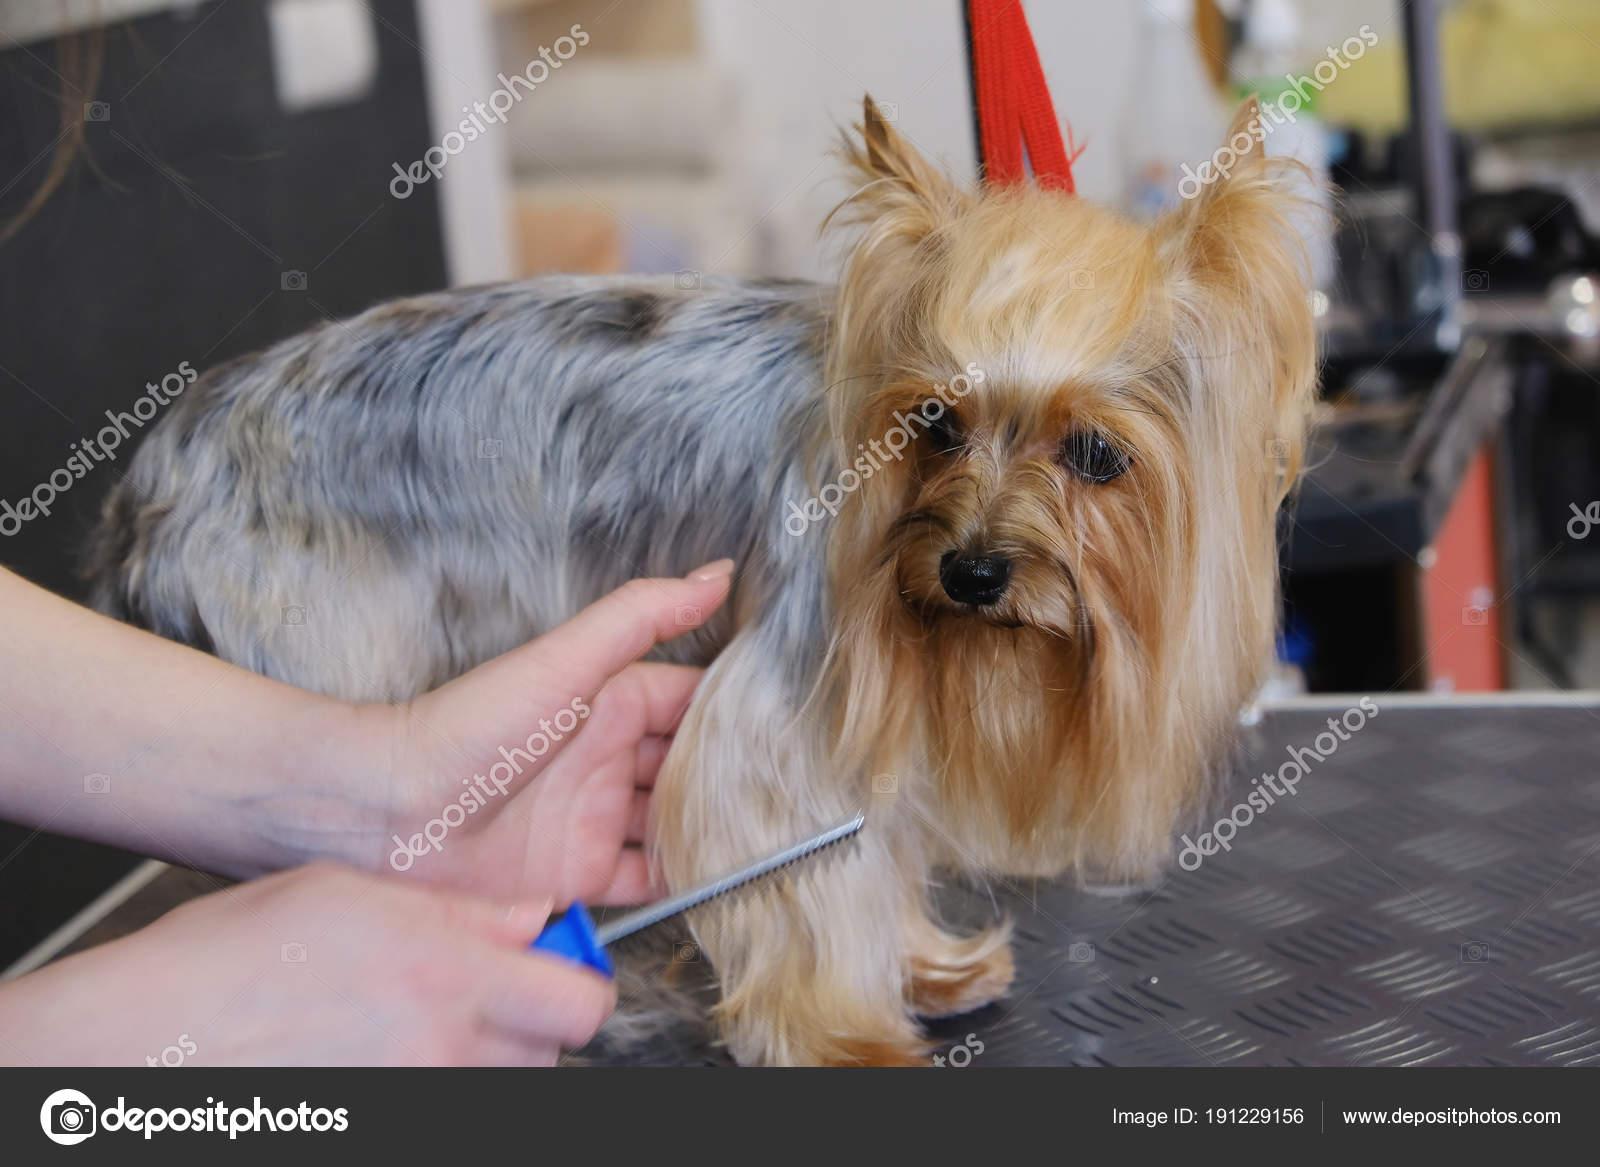 Profesjonalną Opiekę Fryzura I Pies Yorkshire Terrier W Grooming